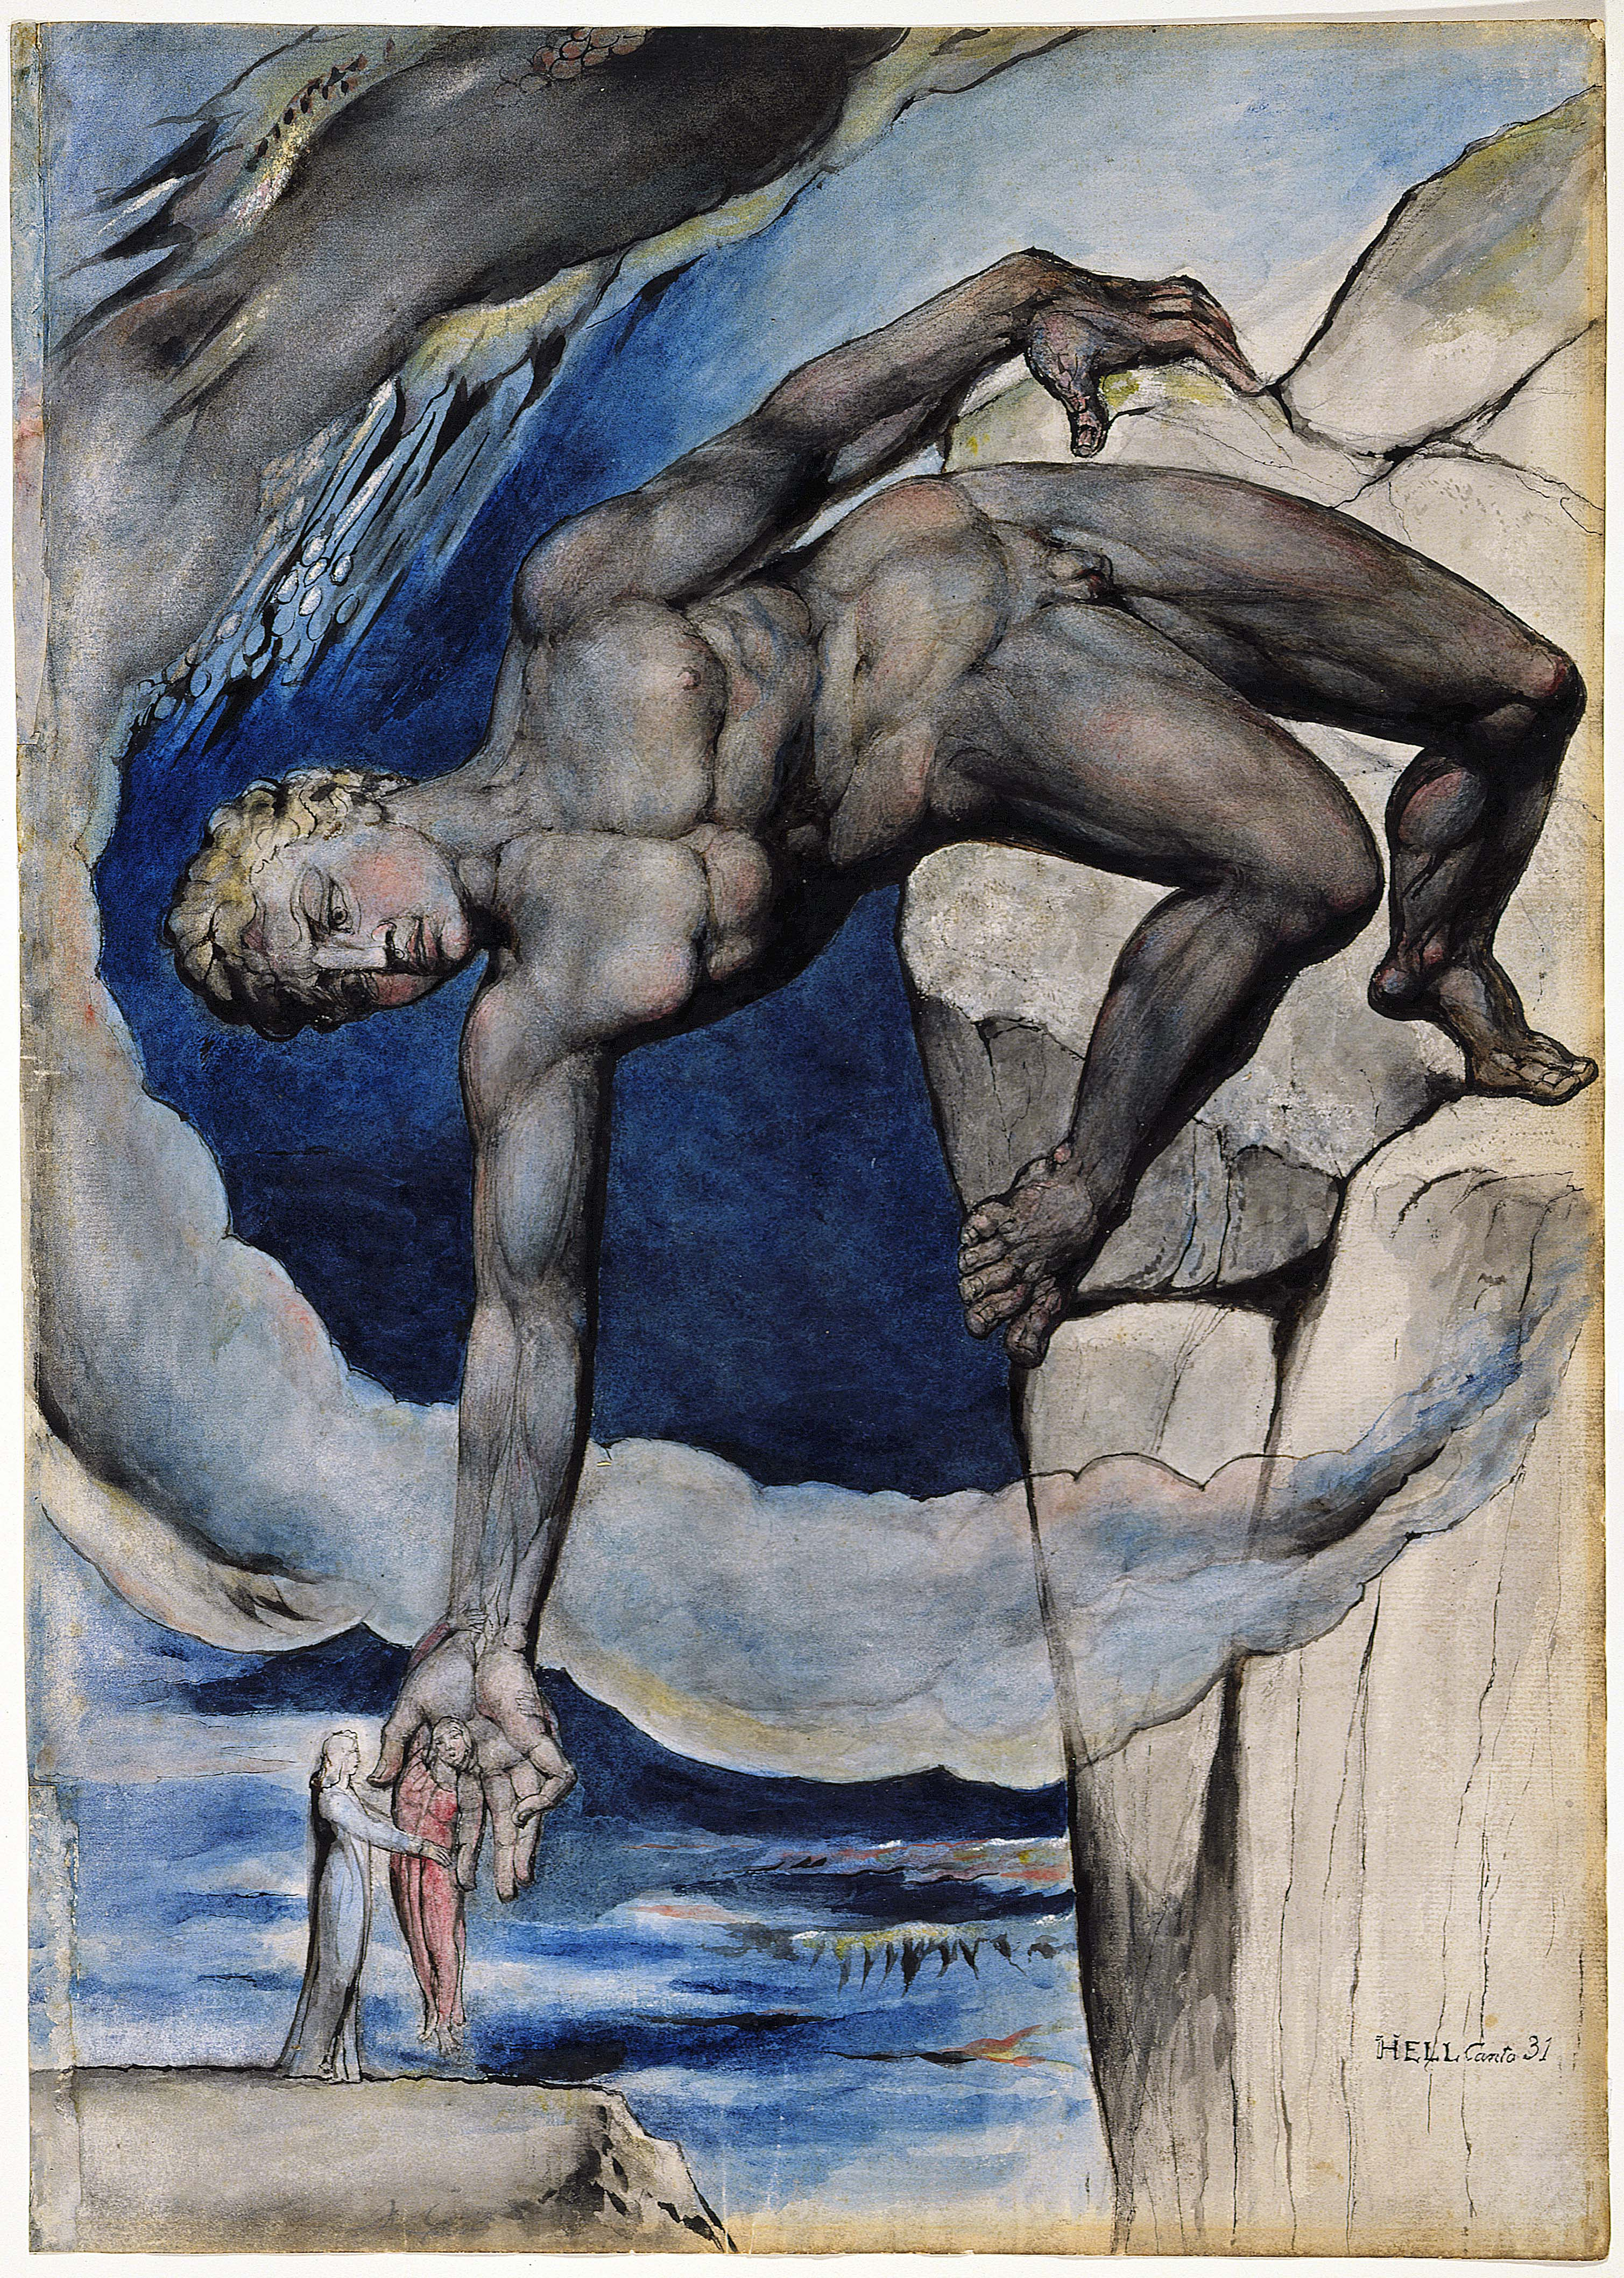 Figure 11 - William Blake, Anteu deposita Dante e Virgílio no último círculo do inferno